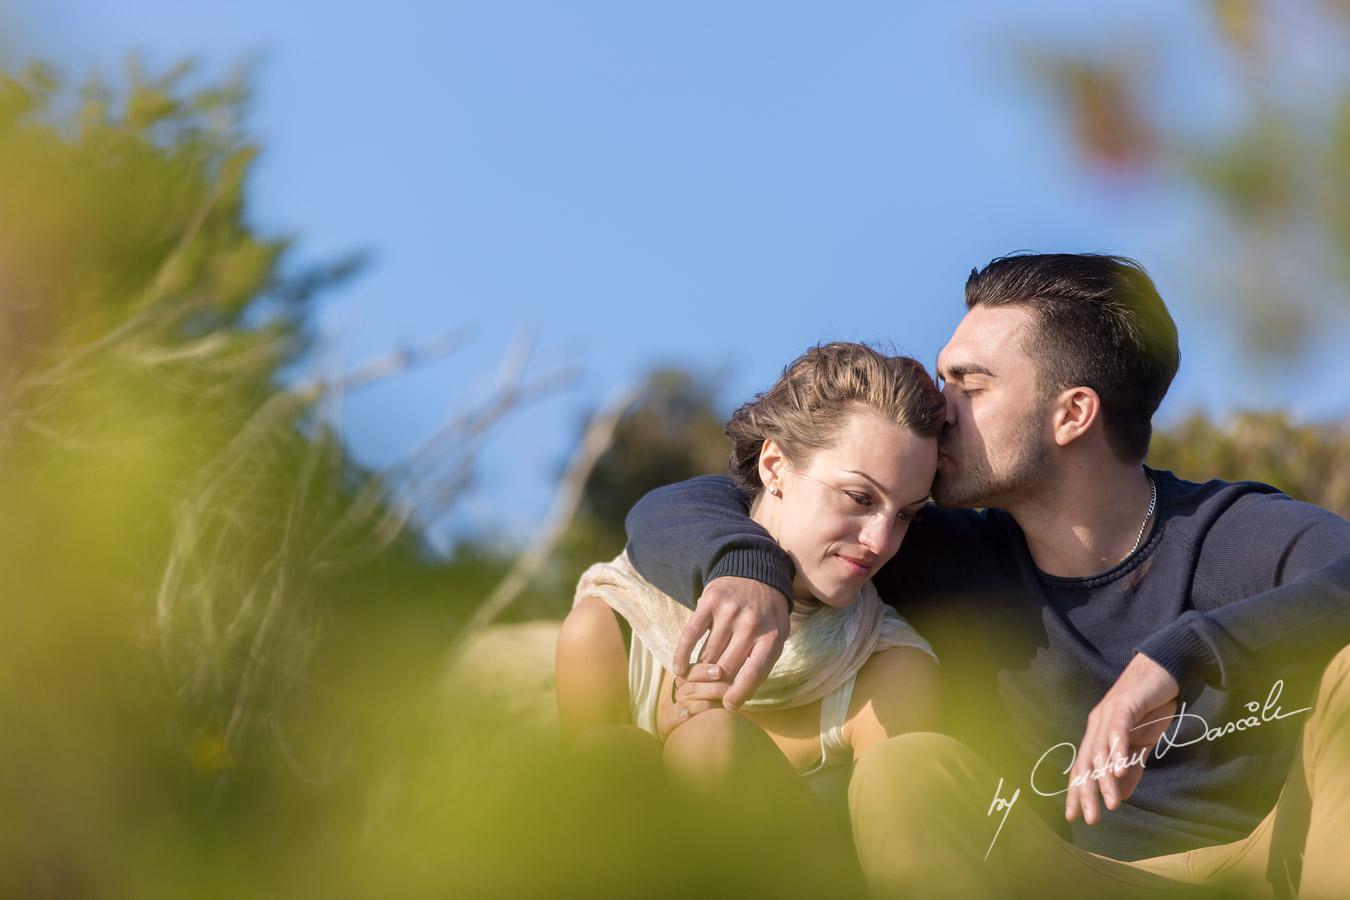 Love at first sight - Karen & Martins at Kurion Cyprus - 14